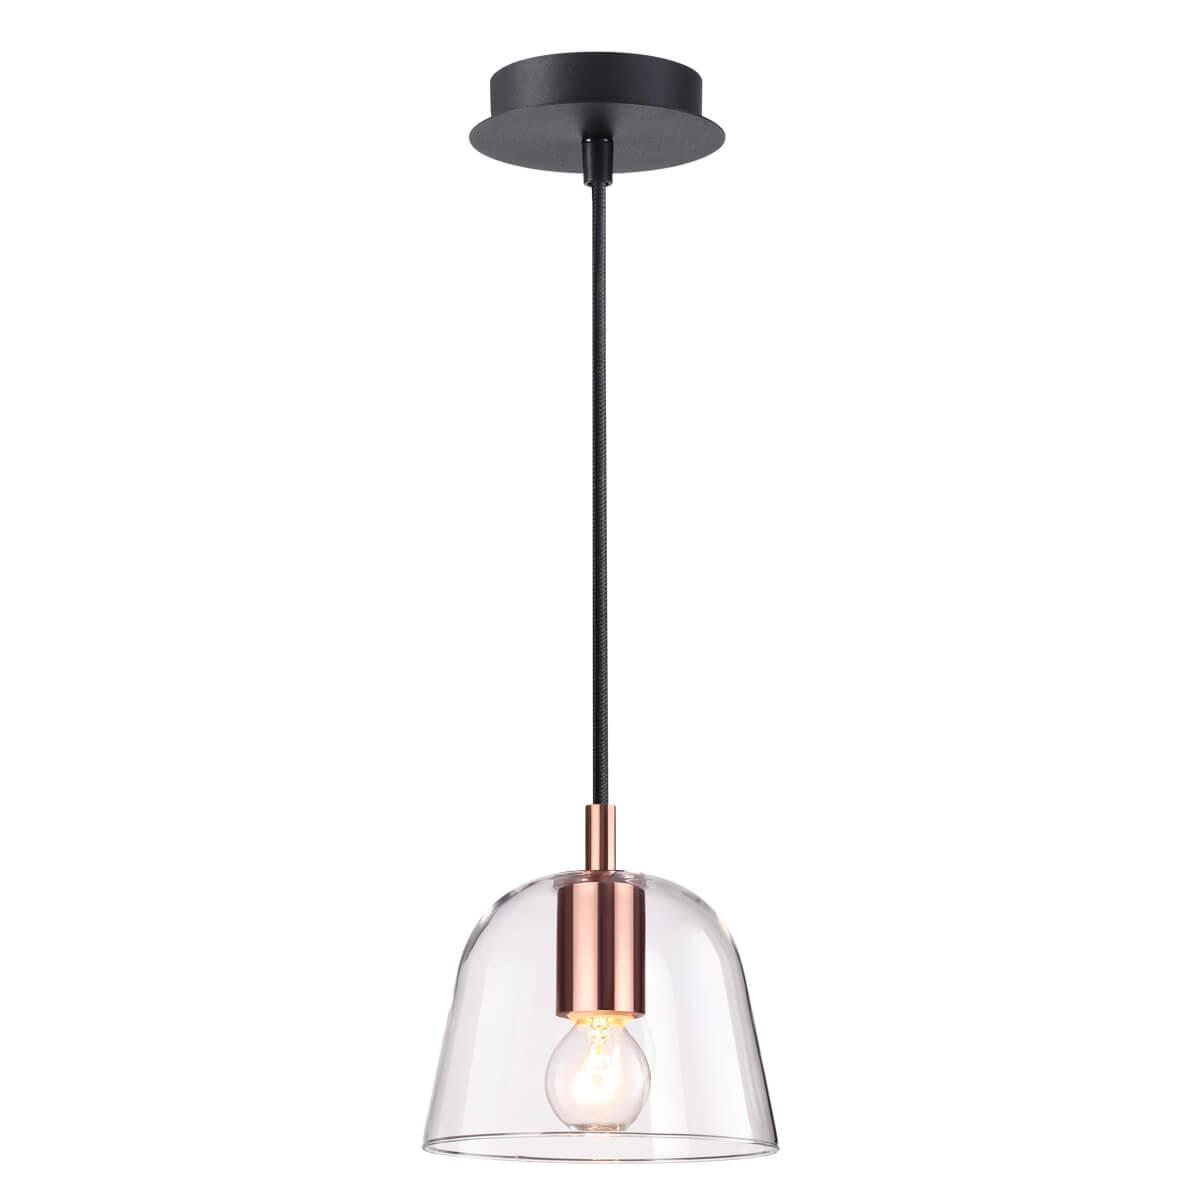 Светильник Lumion 4455/1 Moderni фото